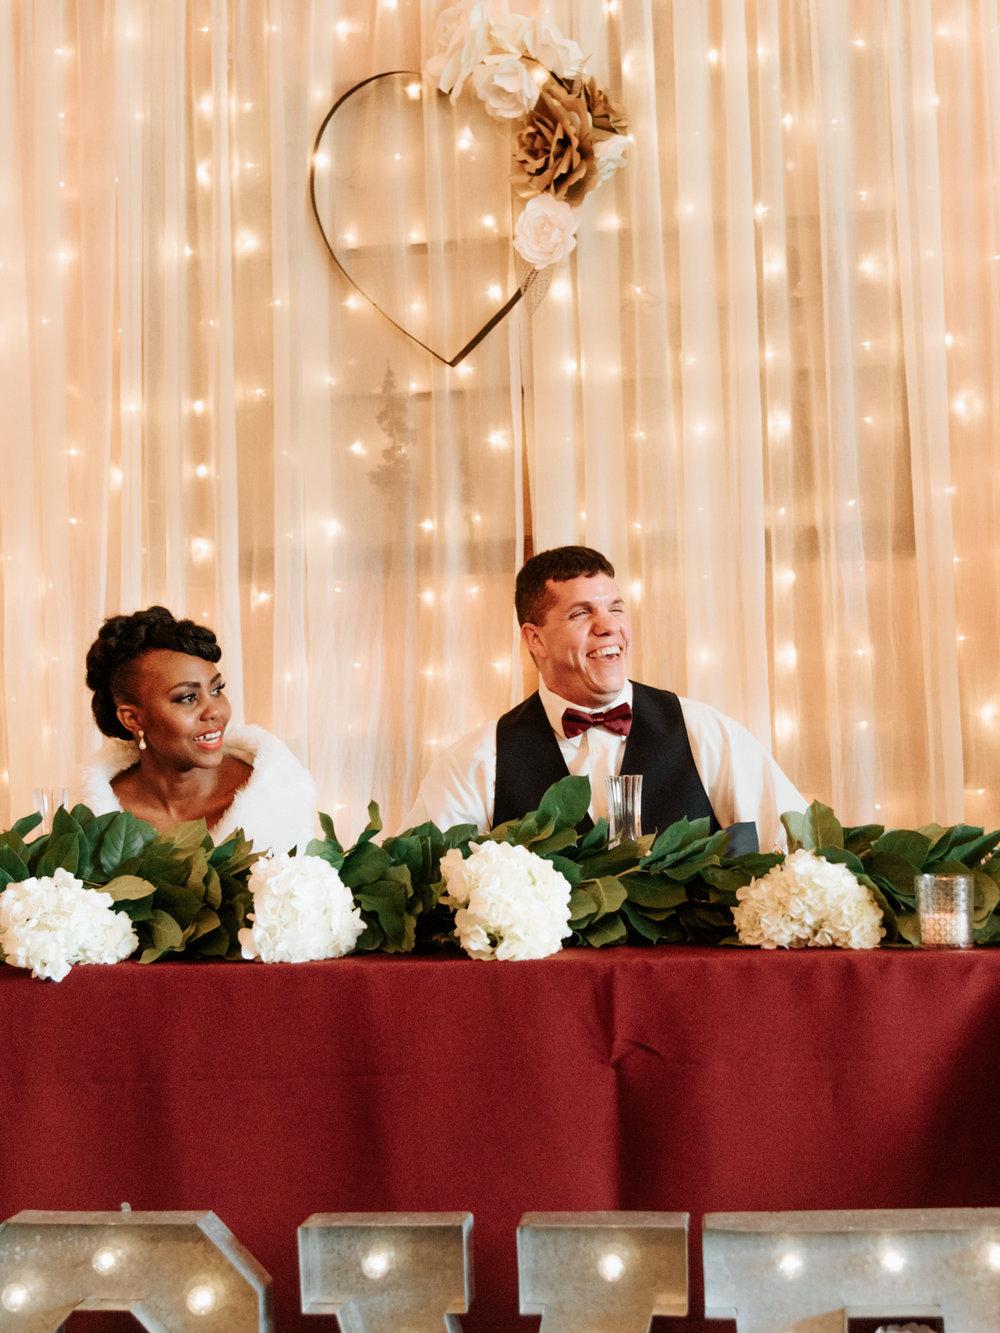 Stolen Glimpses Seattle Wedding Photographer at Rein Fire Ranch 75.jpg